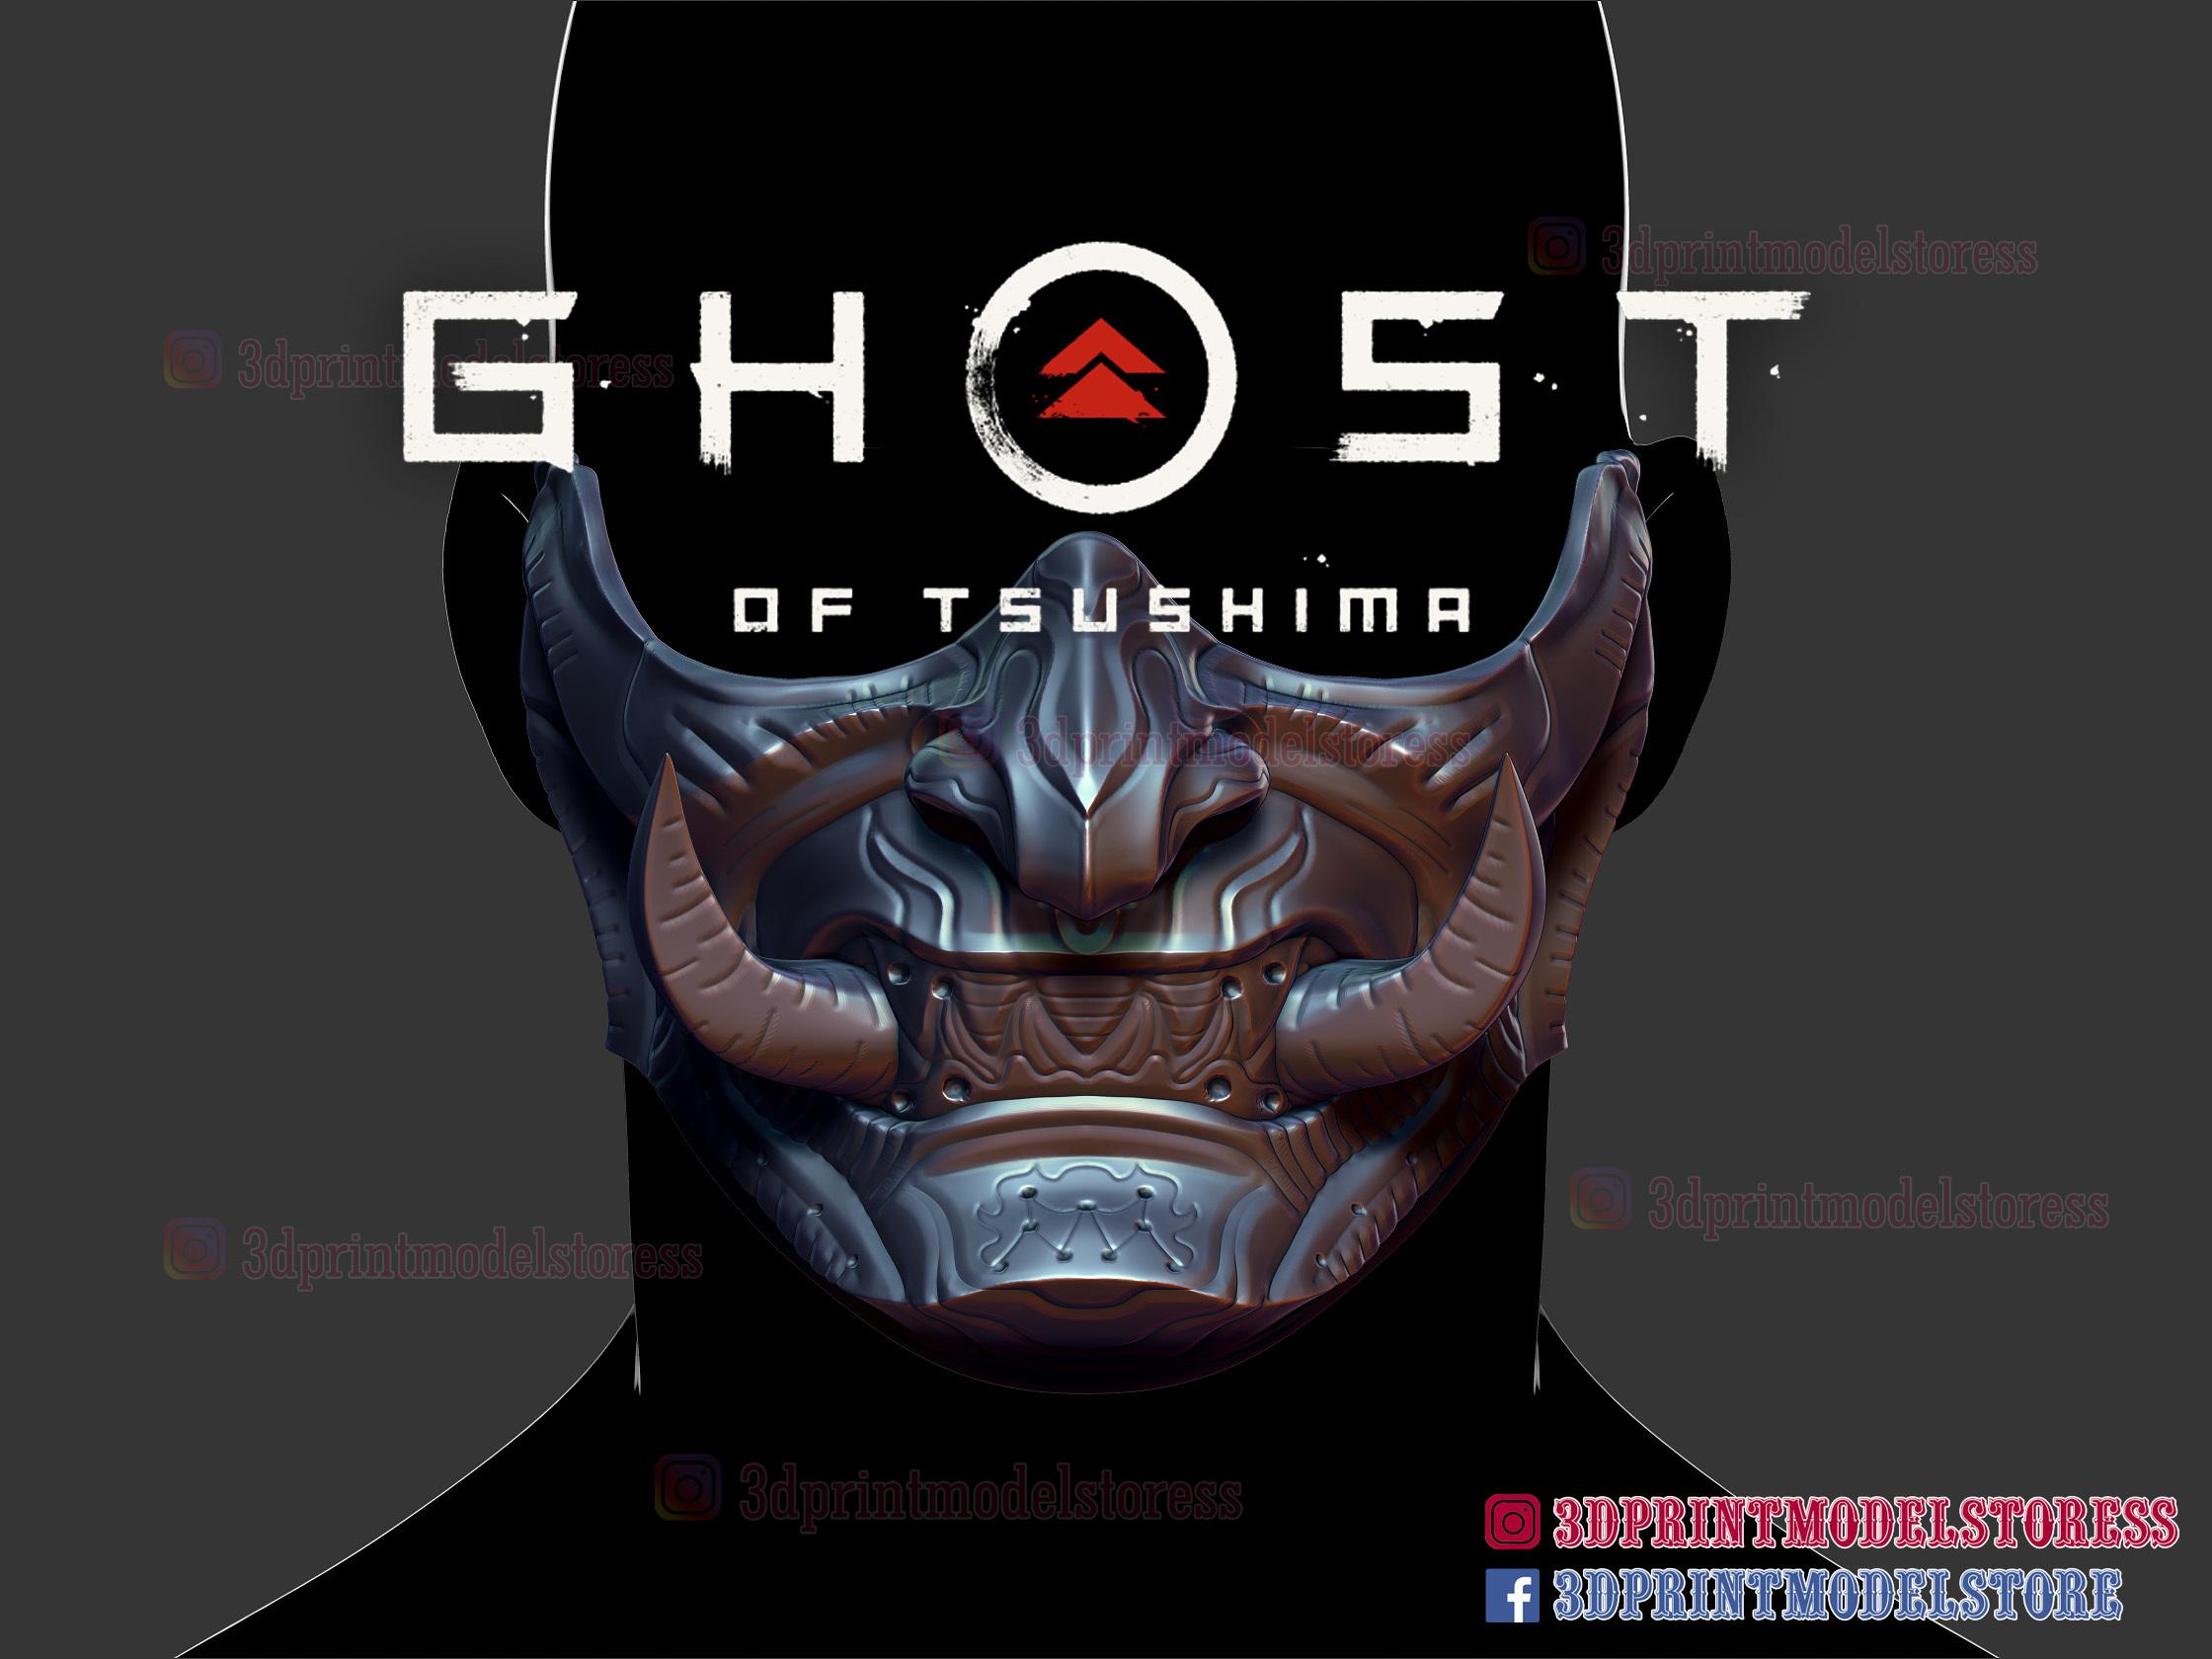 Download Stl File Ghost Of Tsushima Oni Samurai Mask 3d Print Model 3d Printing Model Cults